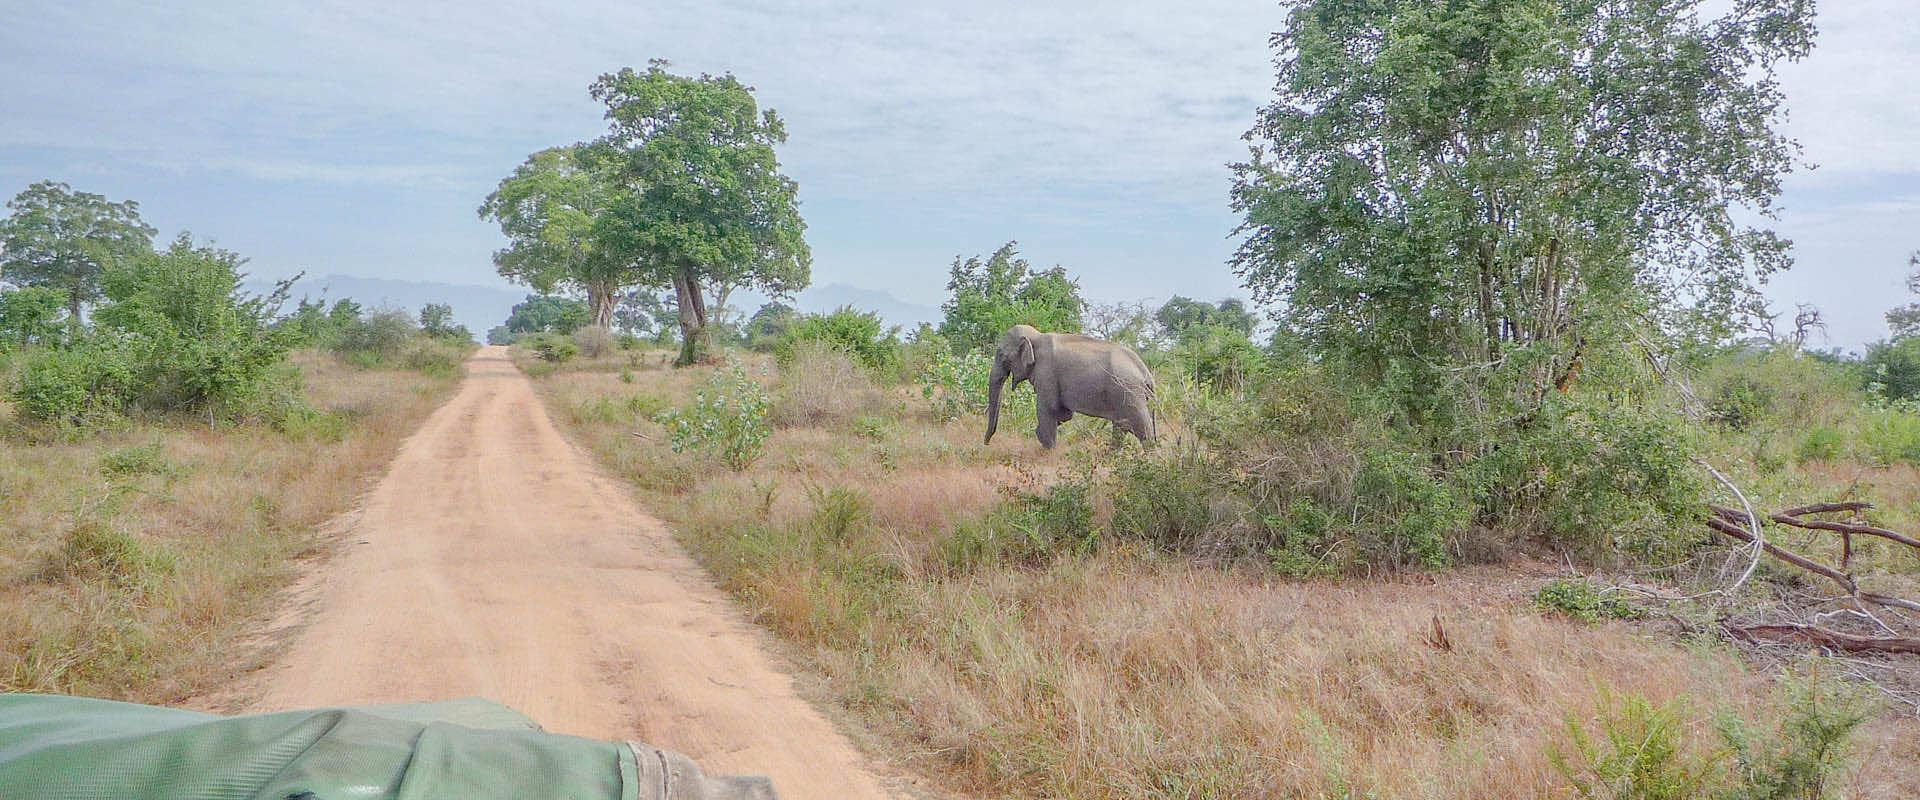 sri lanka jeep safari